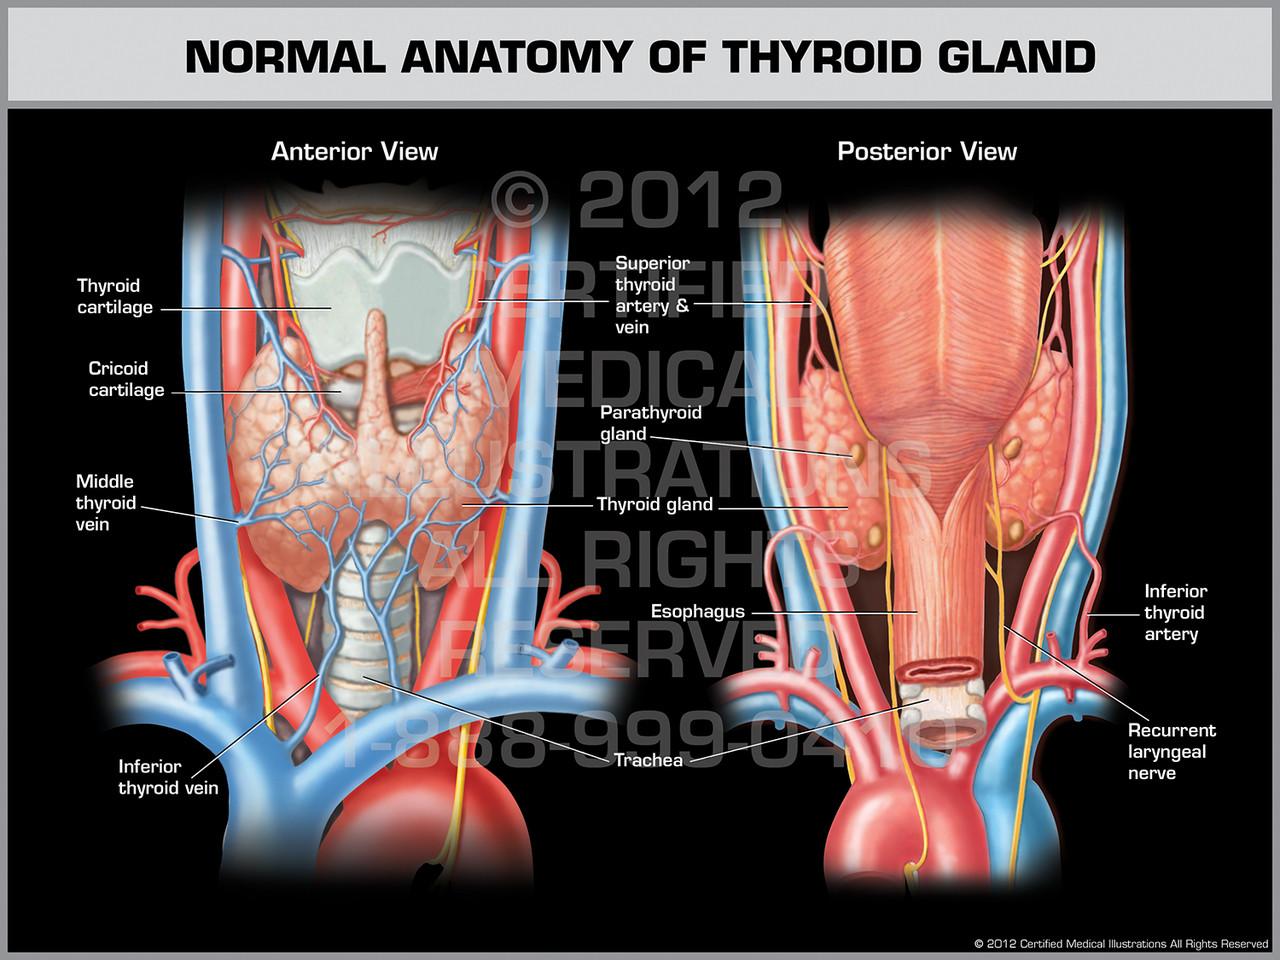 Normal Anatomy Of Thyroid Gland